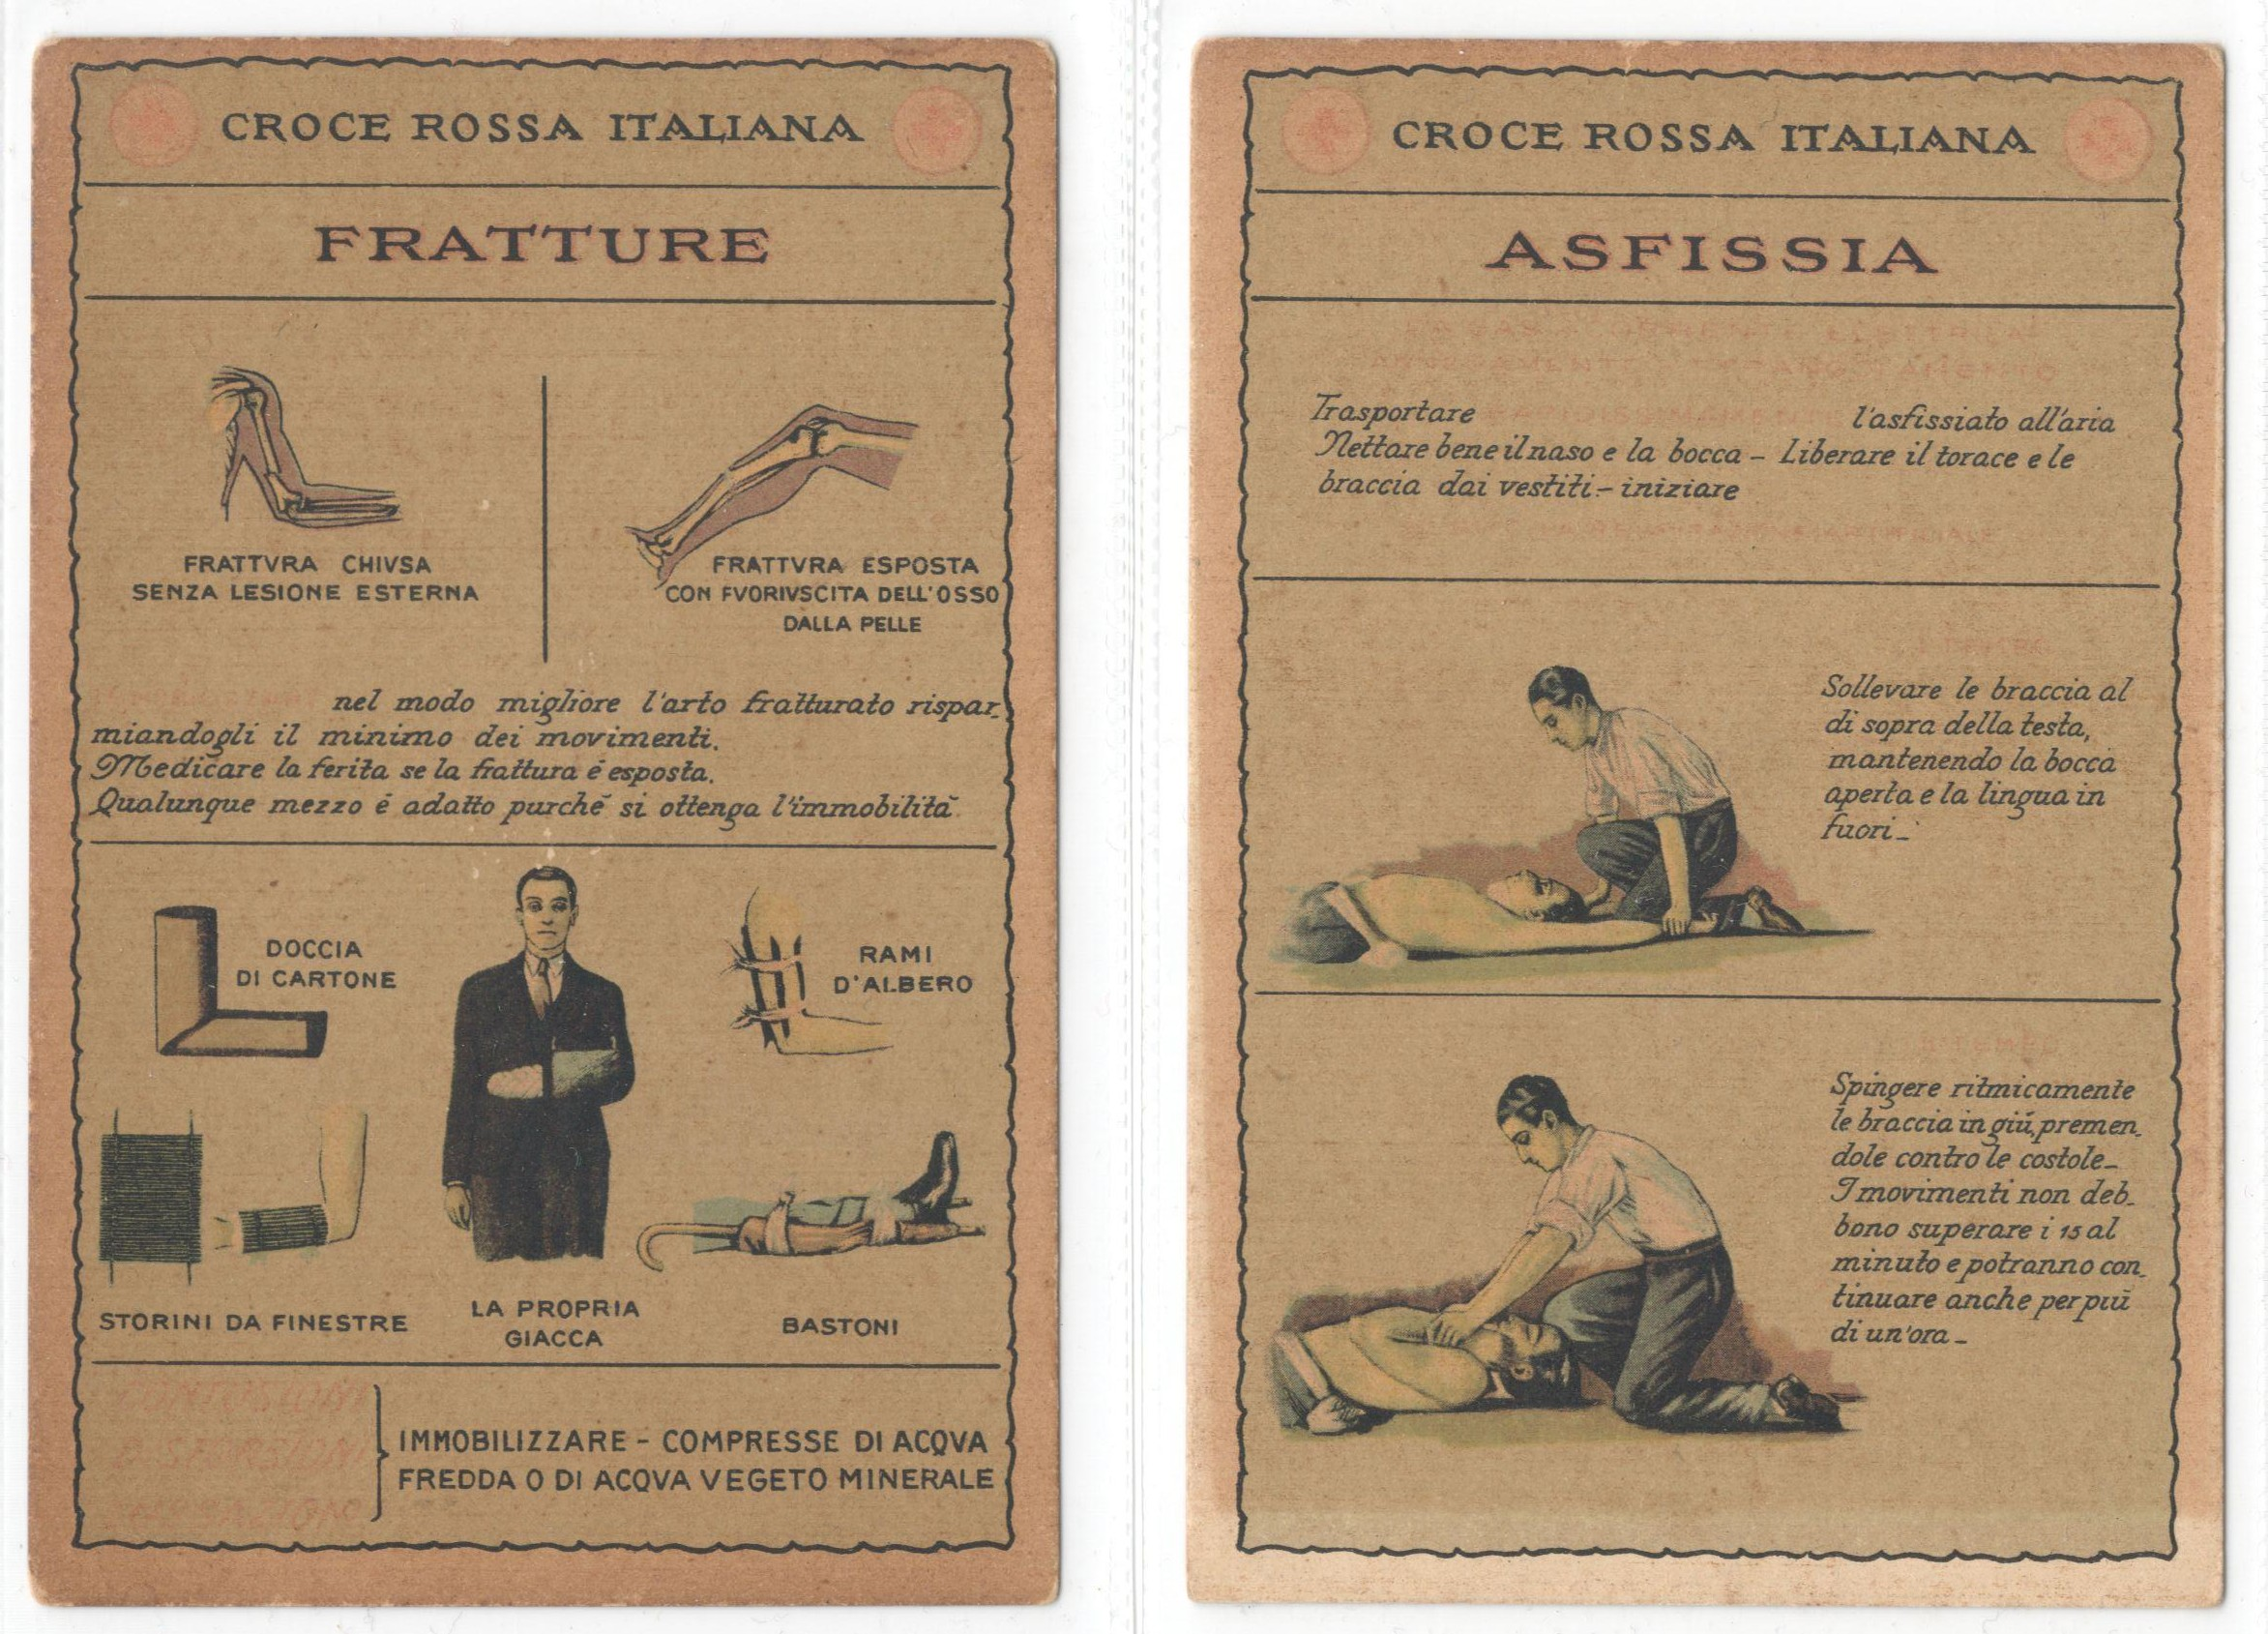 TWO VINTAGE ITALIAN RED CROSS POSTCARDS - CROCE ROSSA ITALIANA FRATTURE & ASFISSIA